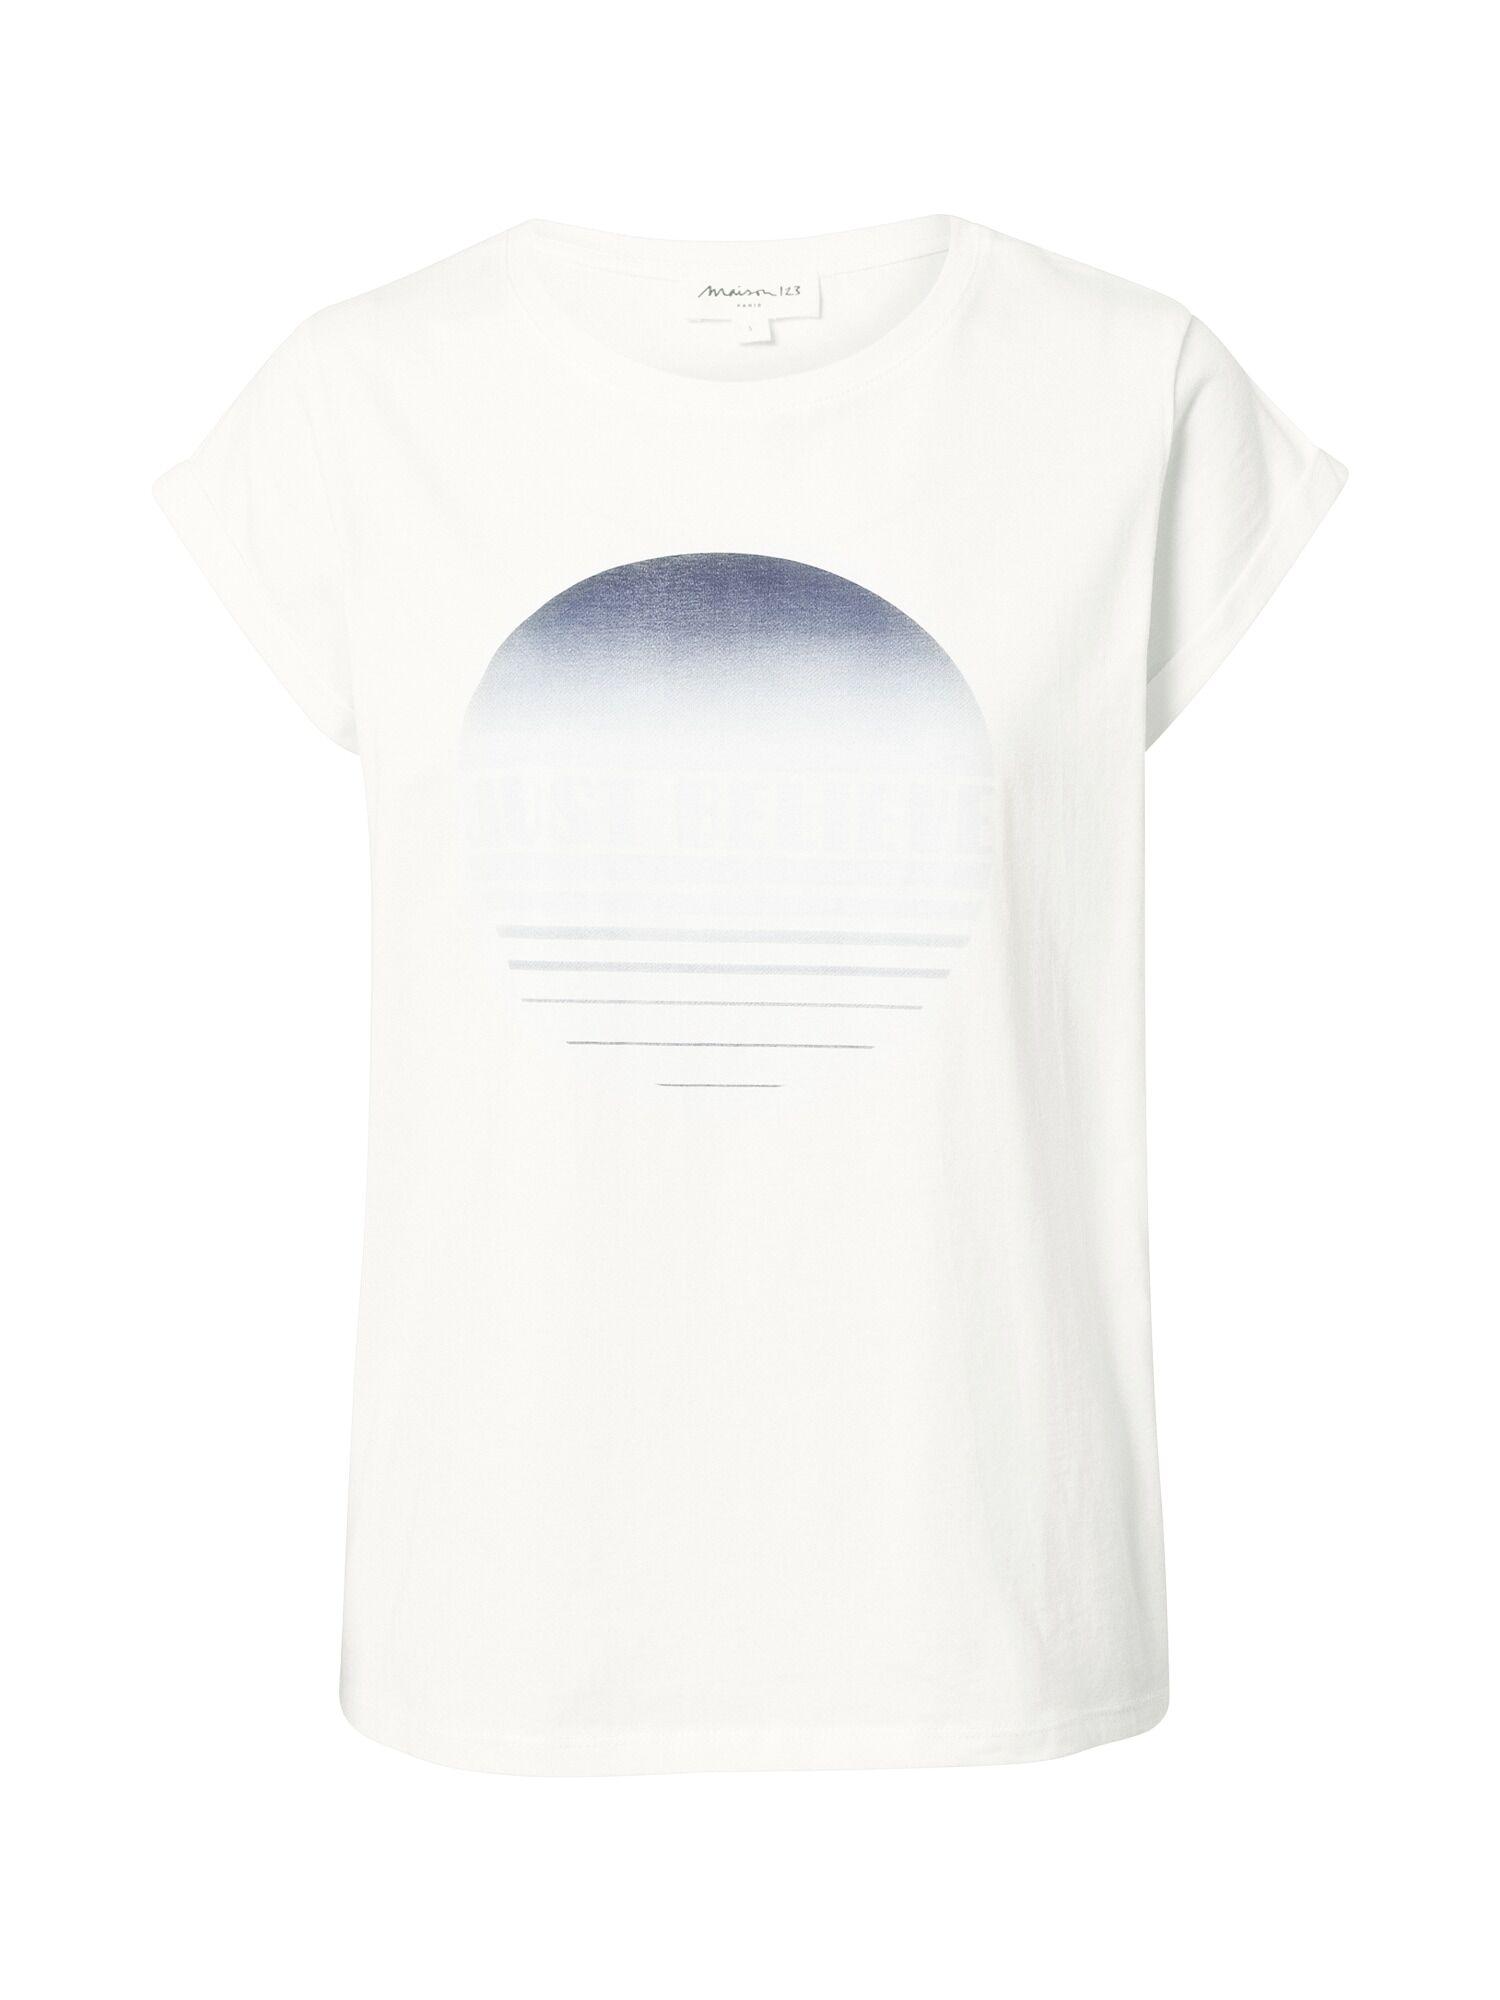 Maison 123 T-shirt 'INNOCENT'  - Beige - Taille: XL - female